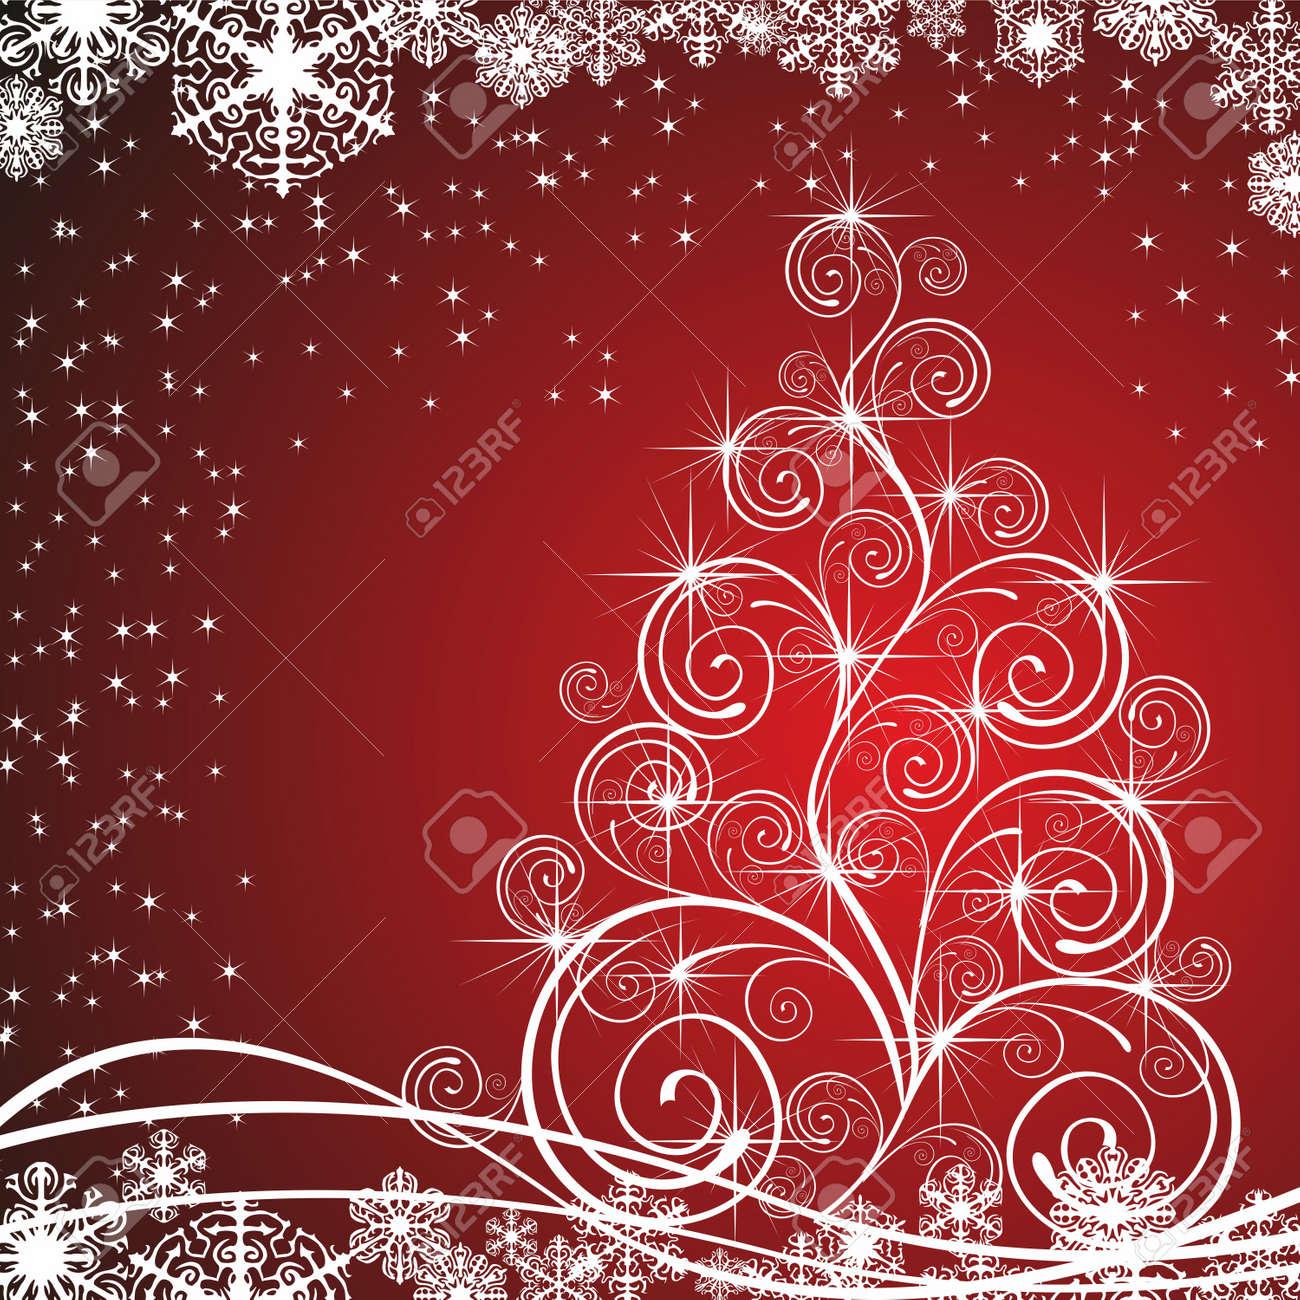 christmas template swirly tree royalty cliparts vectors christmas template swirly tree stock vector 10832264